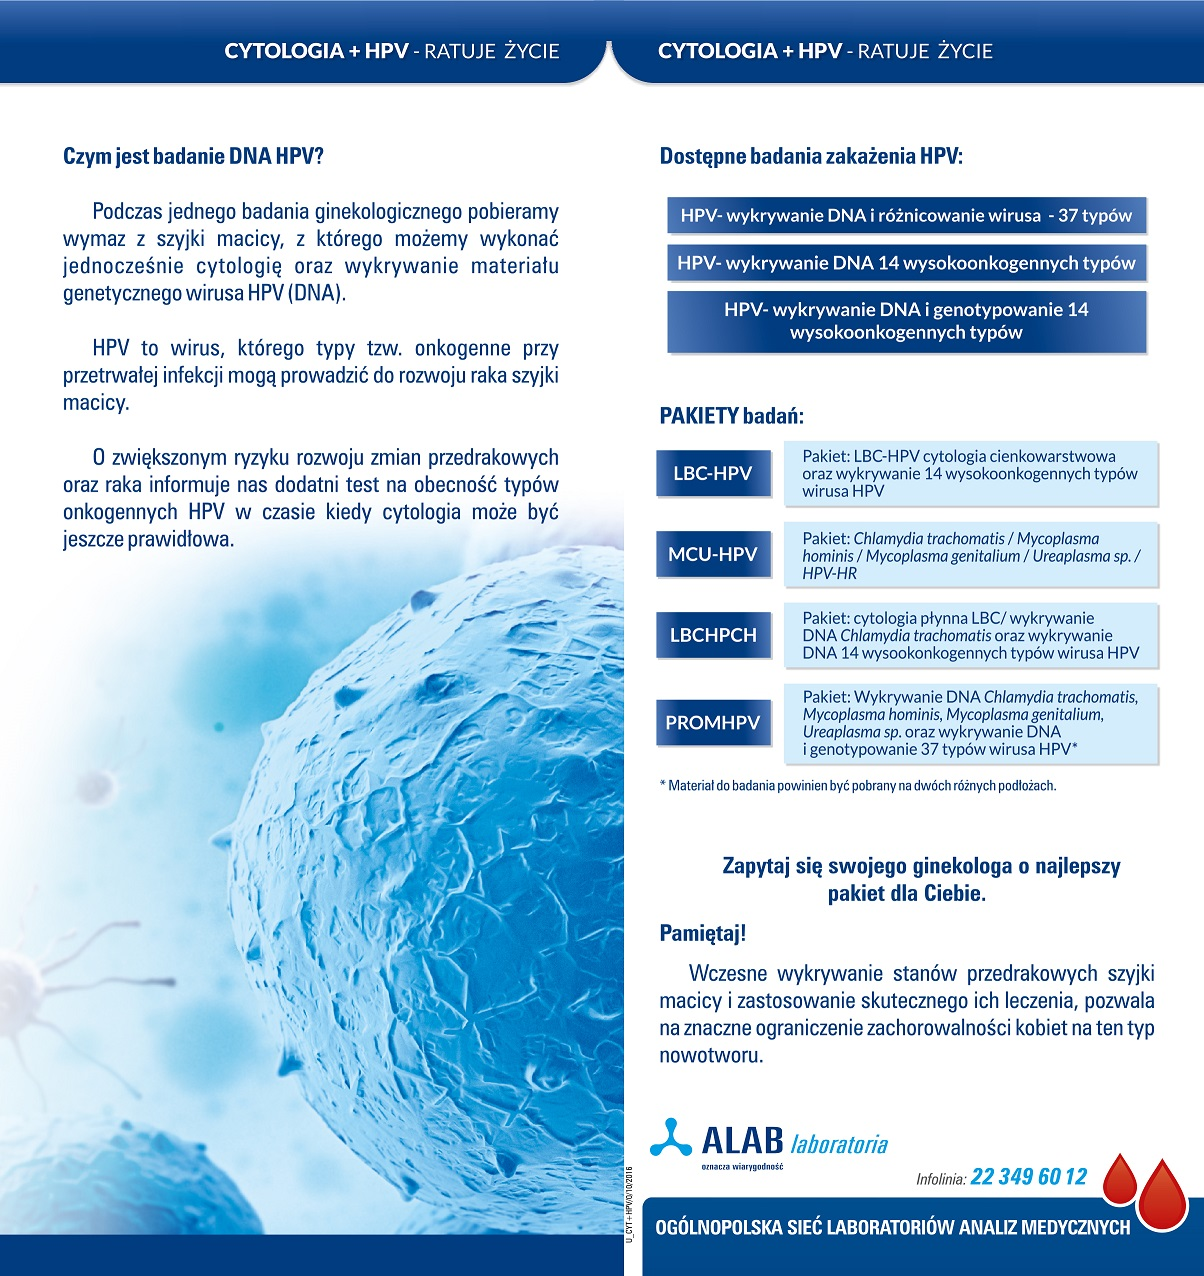 ulotka cytologia HPV_alab laboratoria2